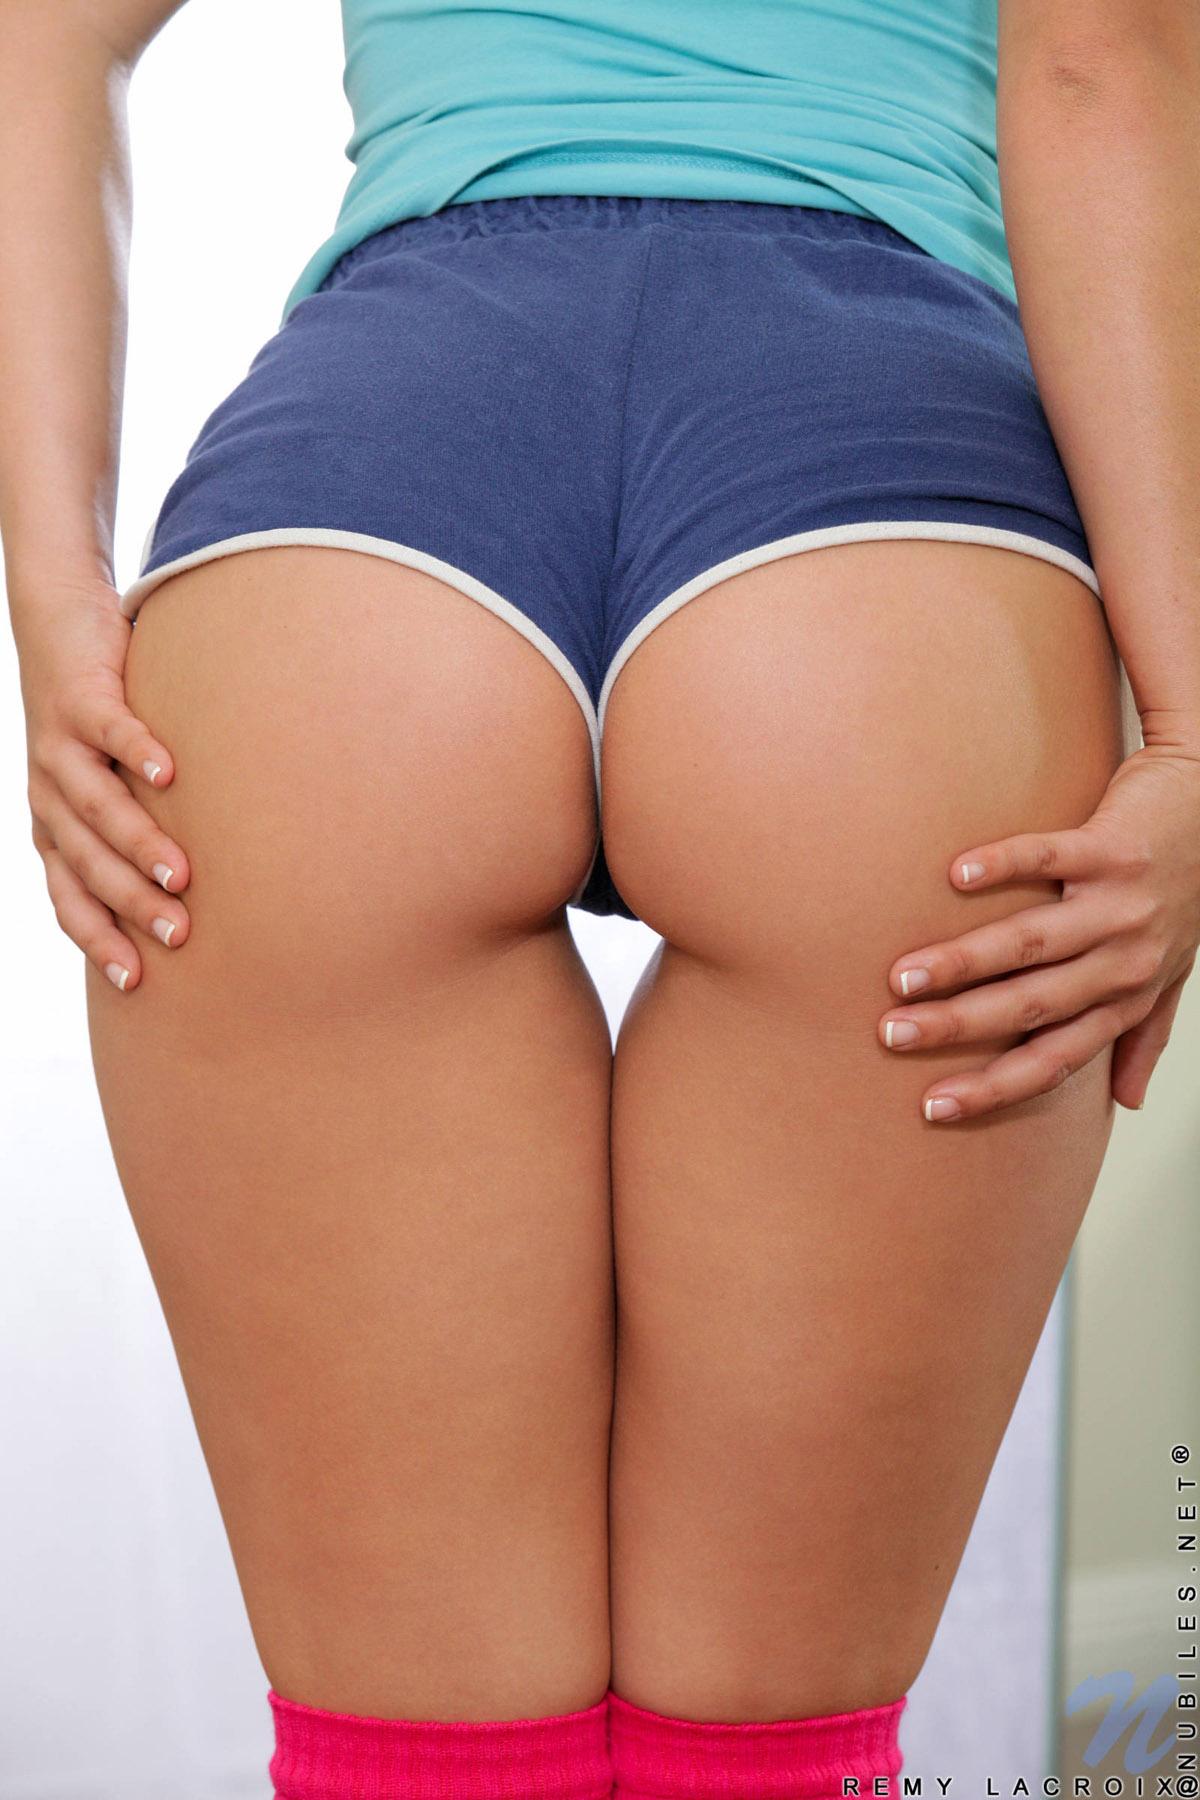 Best booty short pics